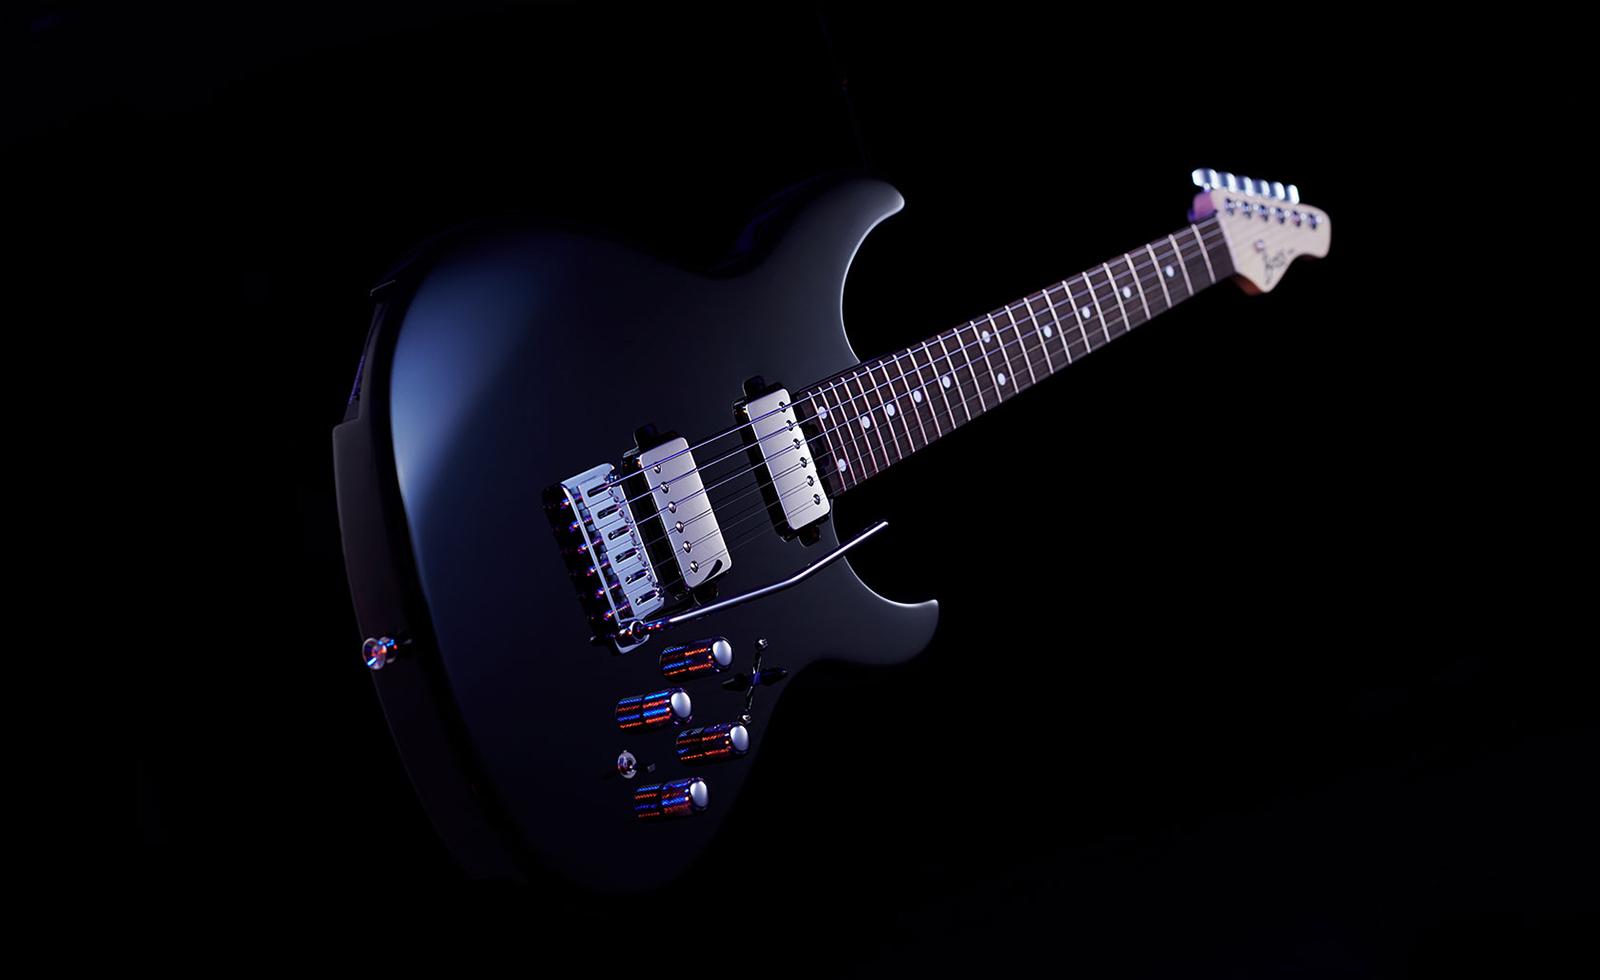 EURUS GS-1